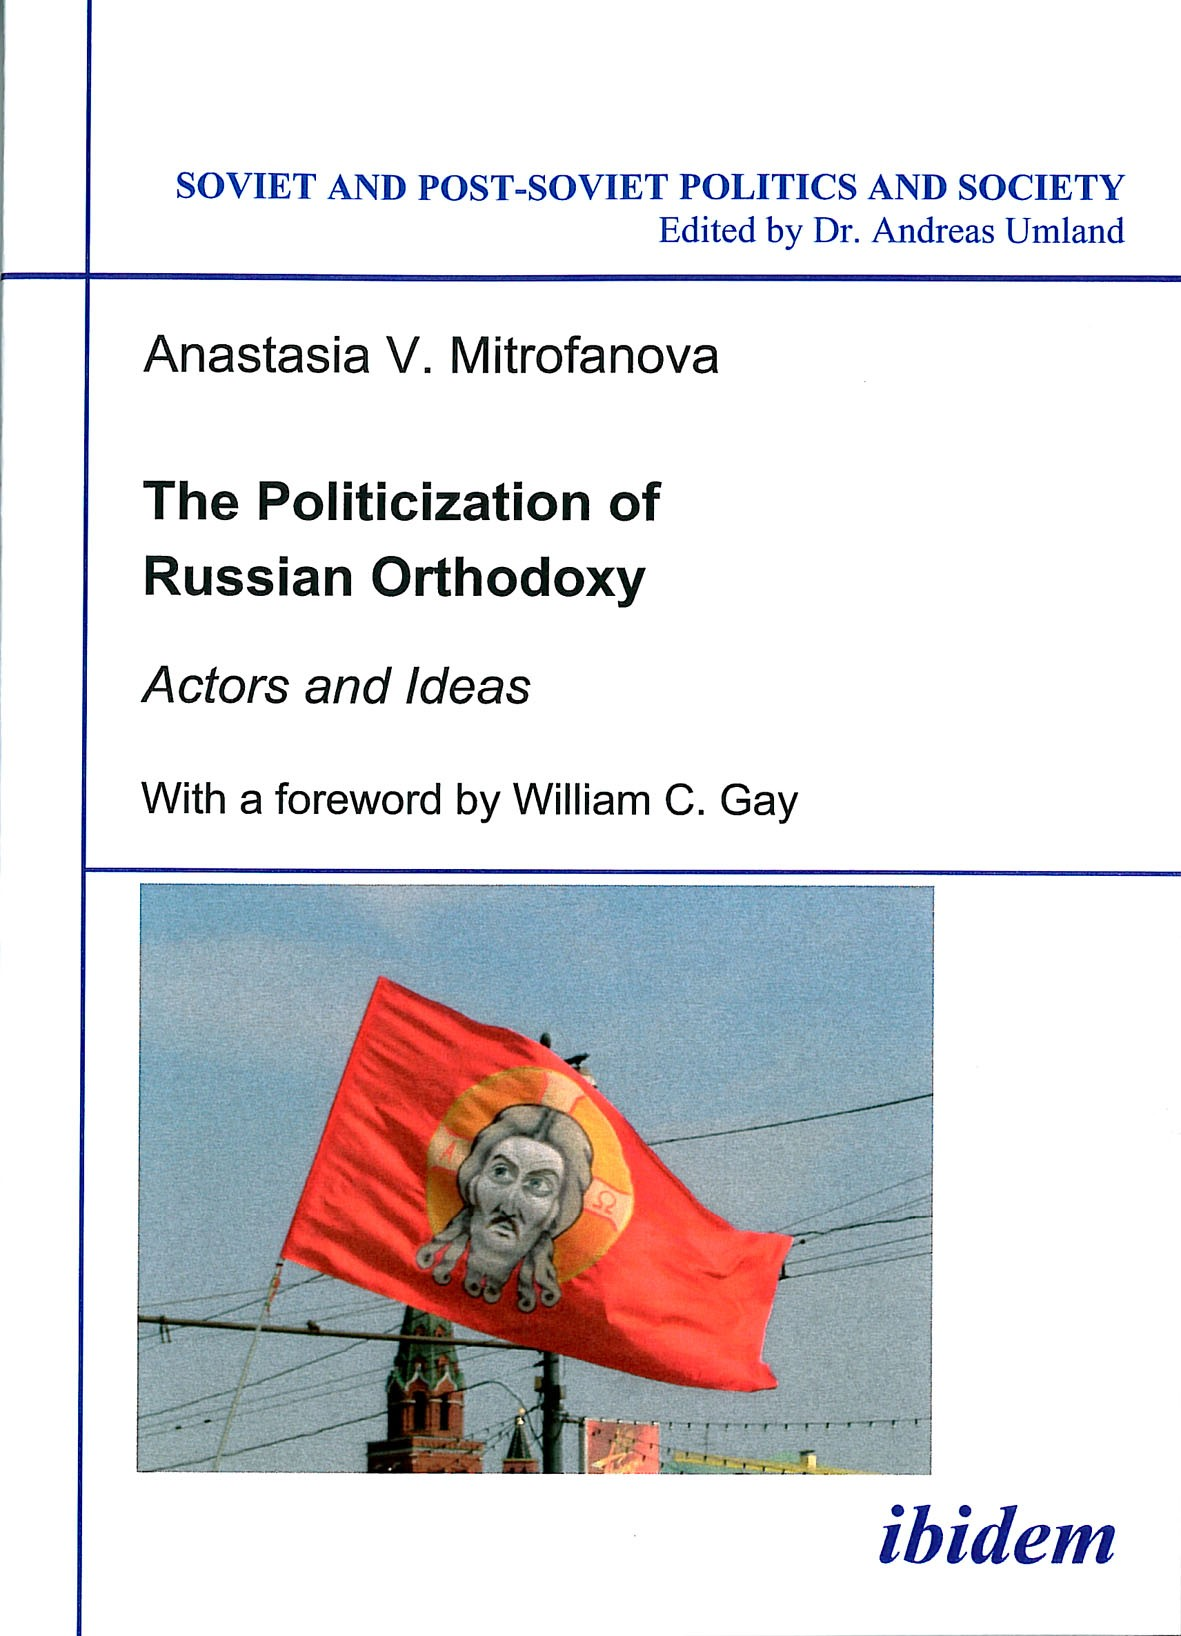 The Politicization of Russian Orthodoxy